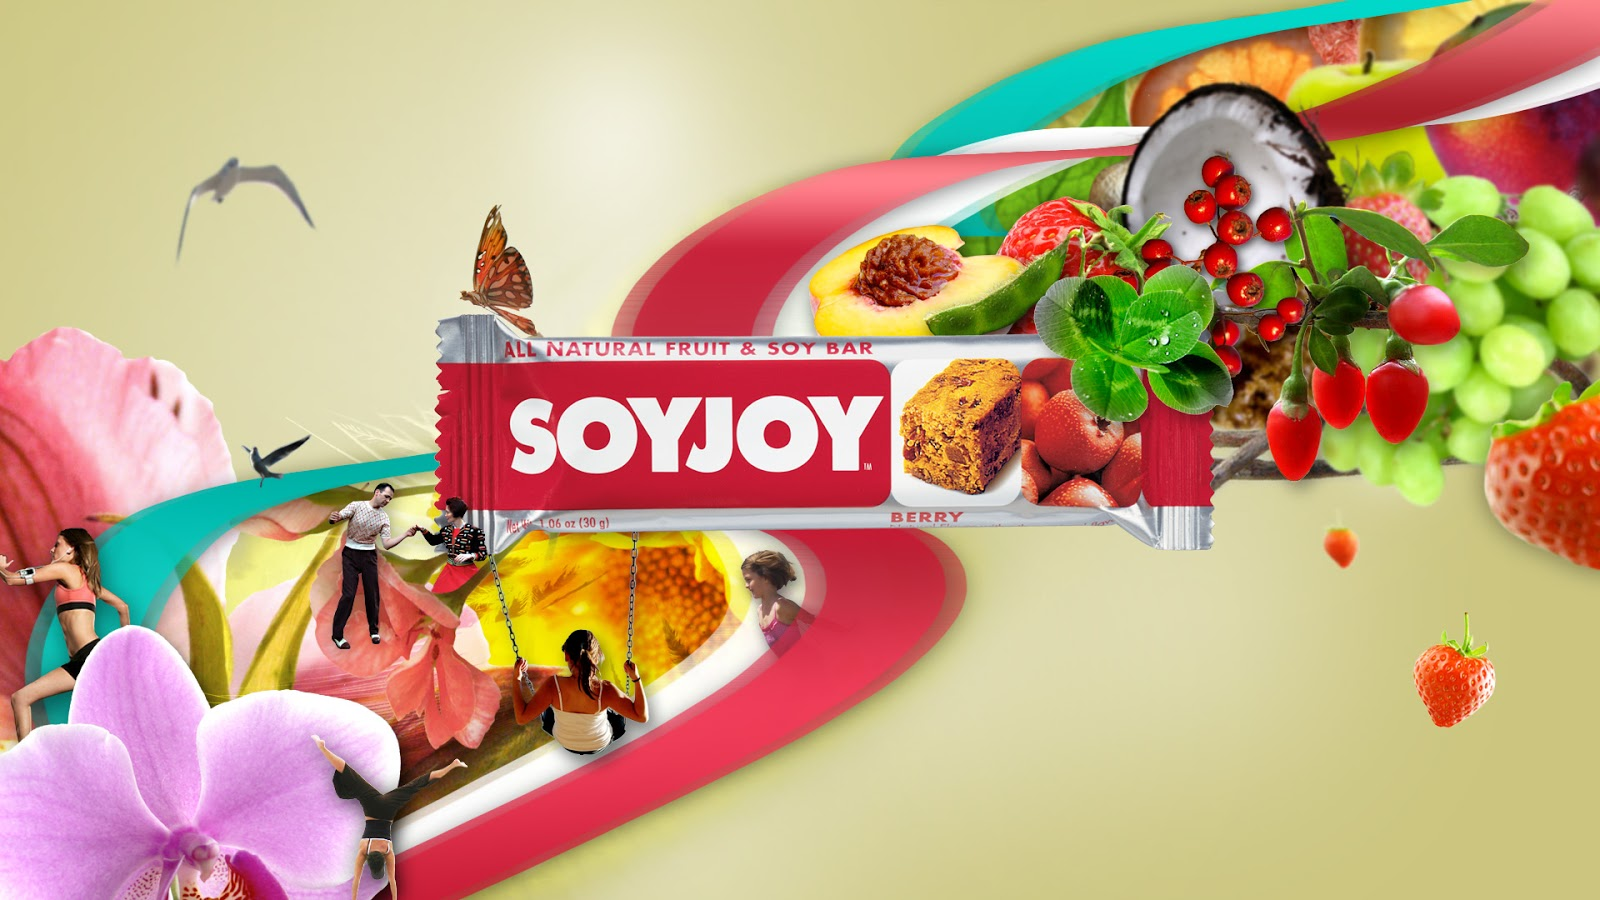 Dengan Makanan Rendah Kalori Dari Soyjoy Diet Anda Akan Lebih